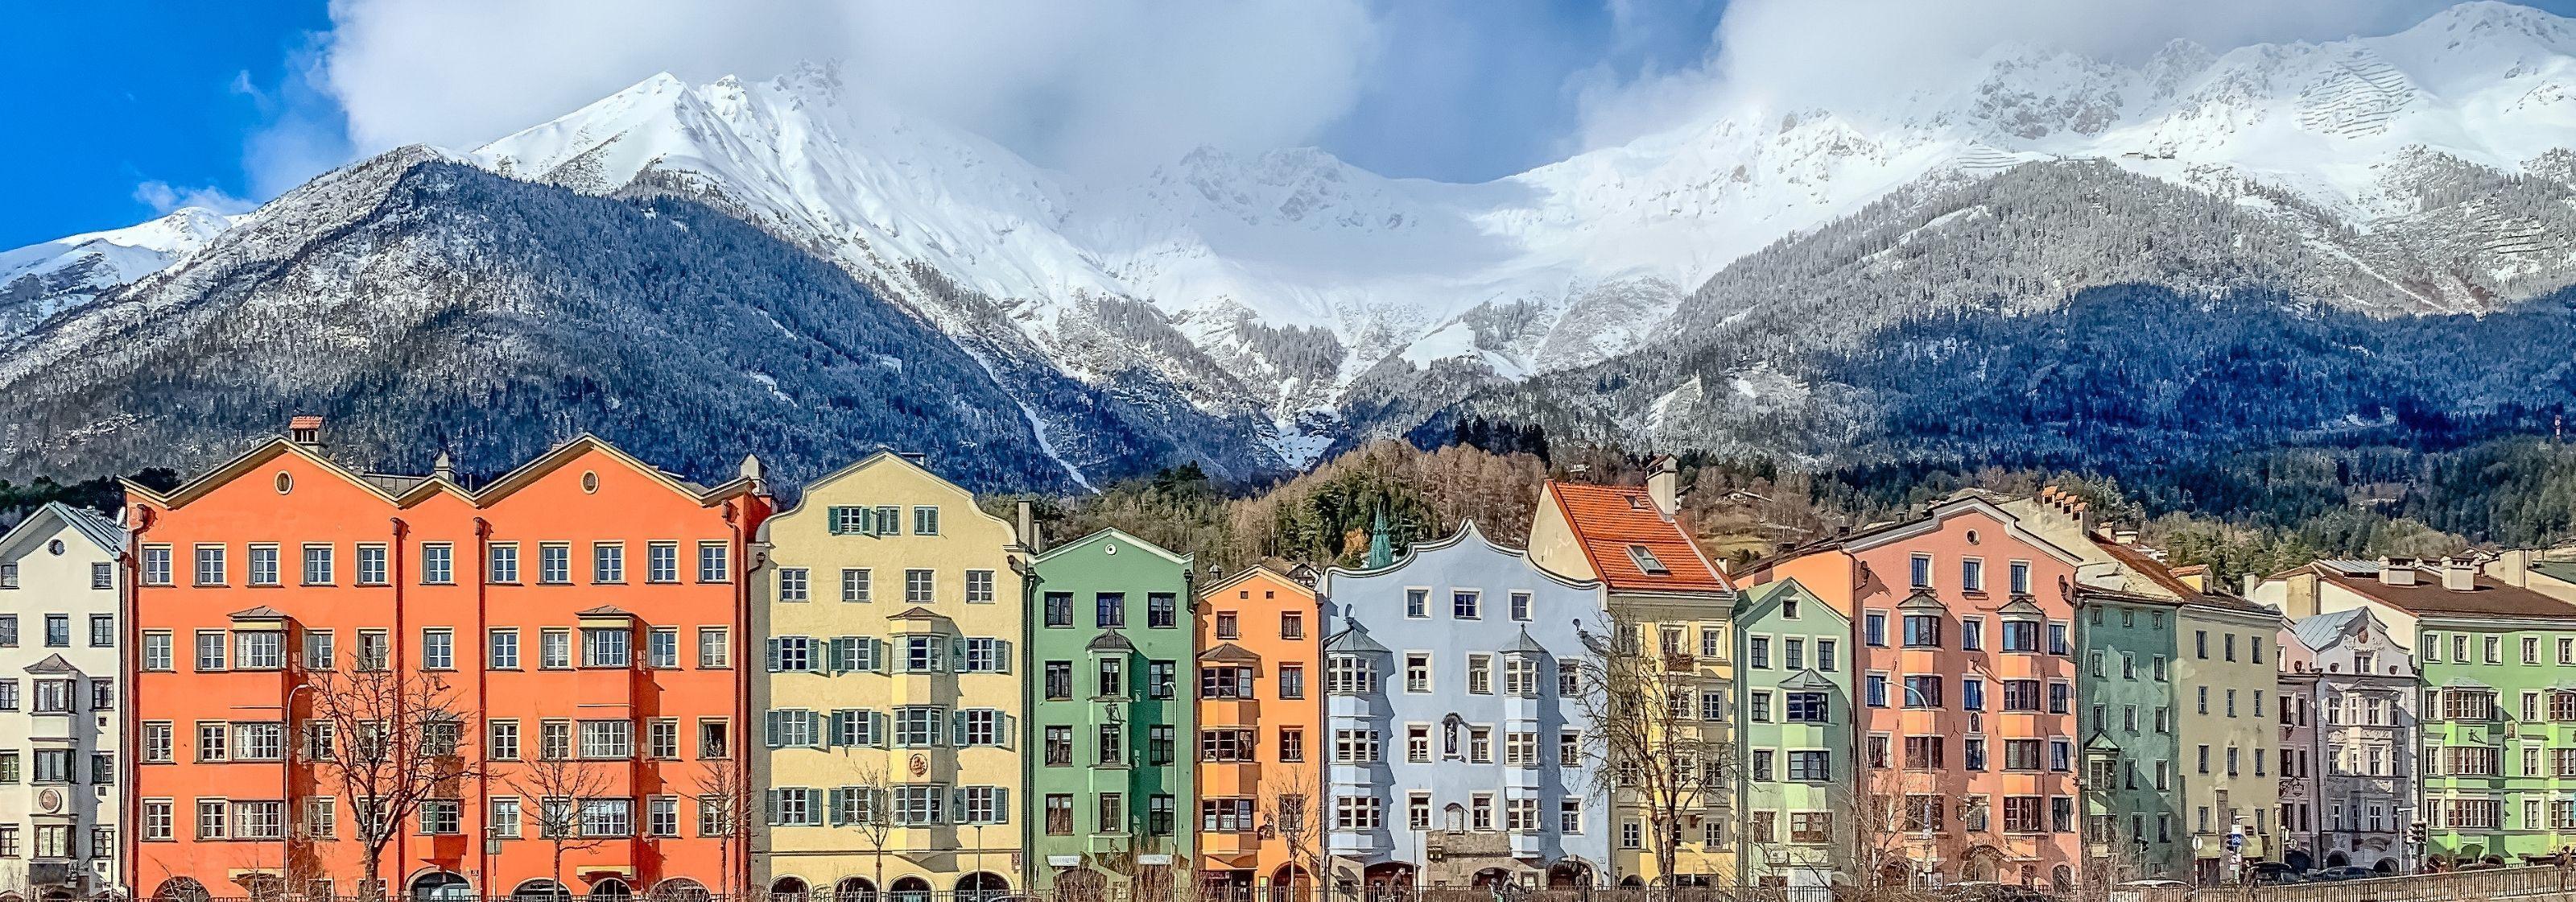 Cosas que hacer en Innsbruck